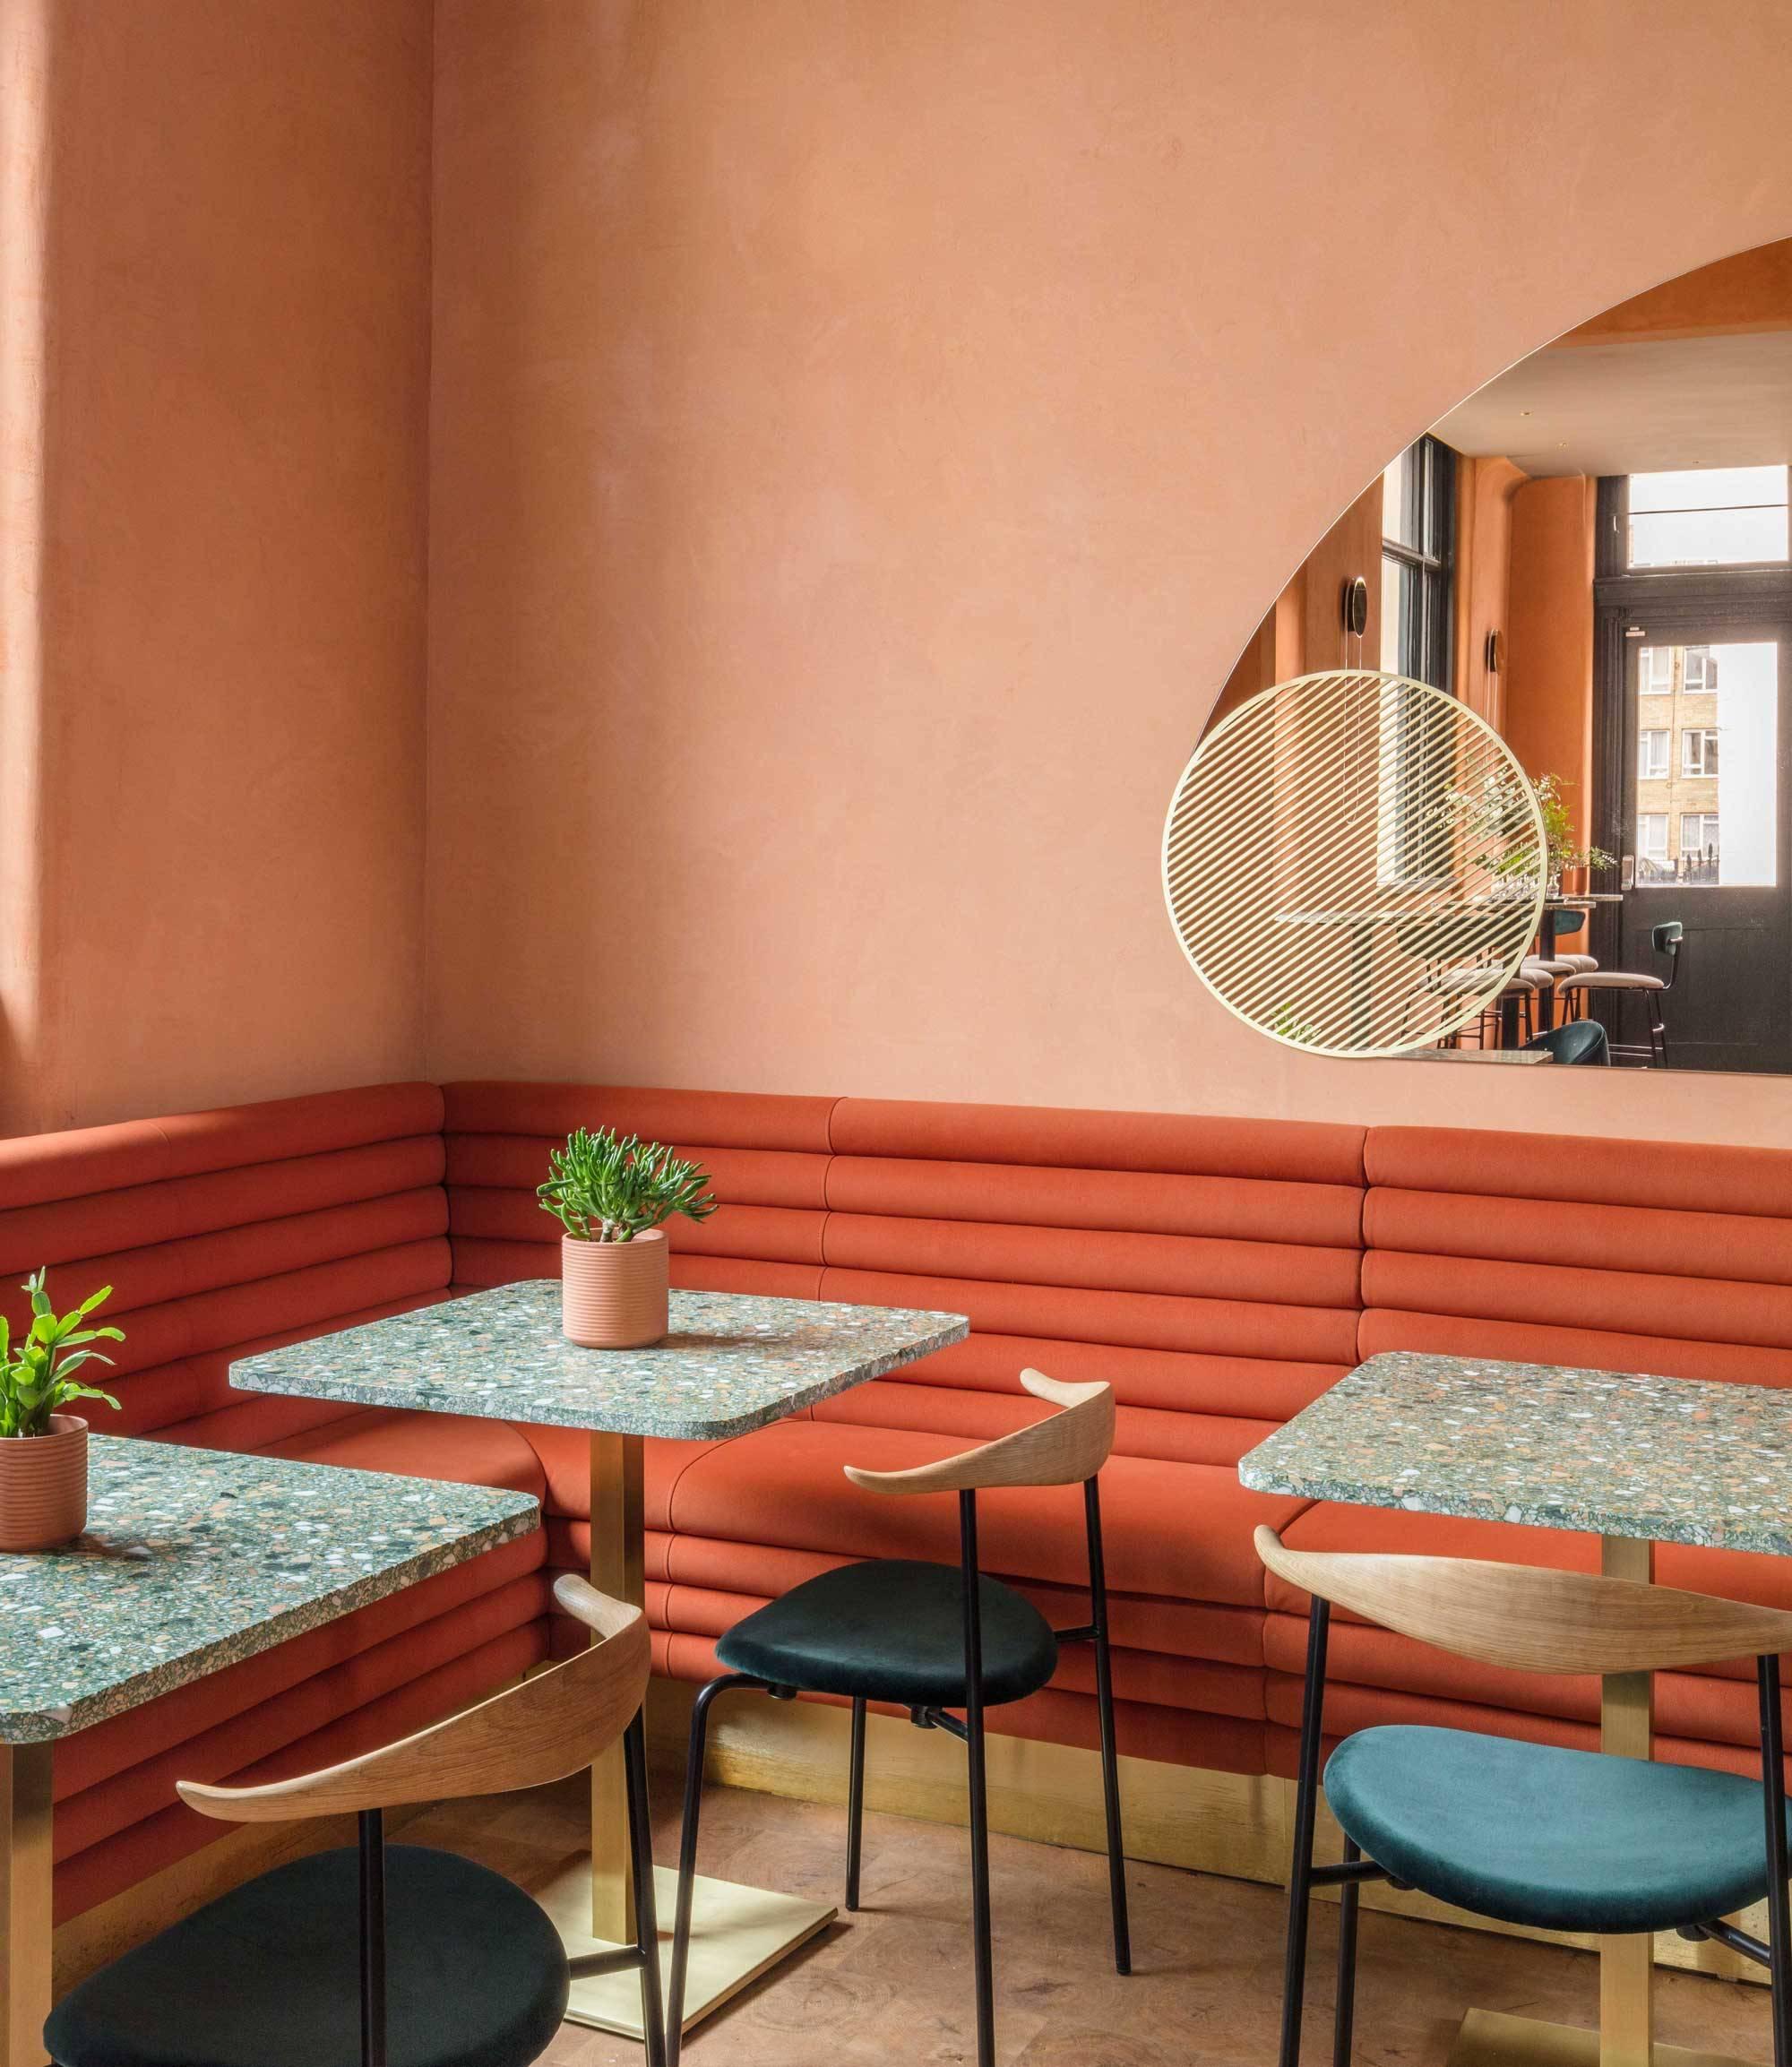 omars-place-stella-concept-restaurant-london-3.jpg